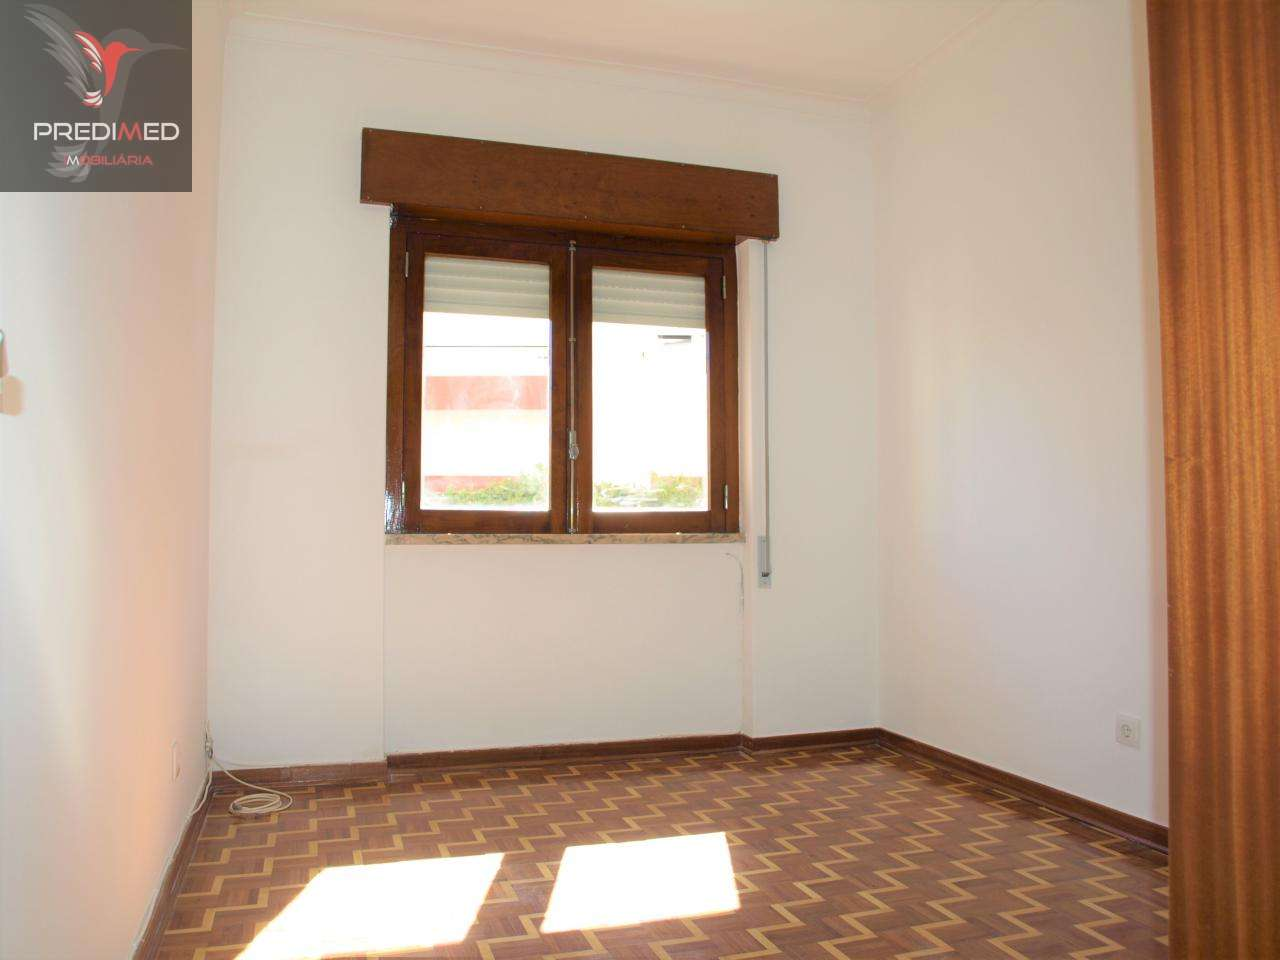 Apartamento para arrendar, Corroios, Setúbal - Foto 4